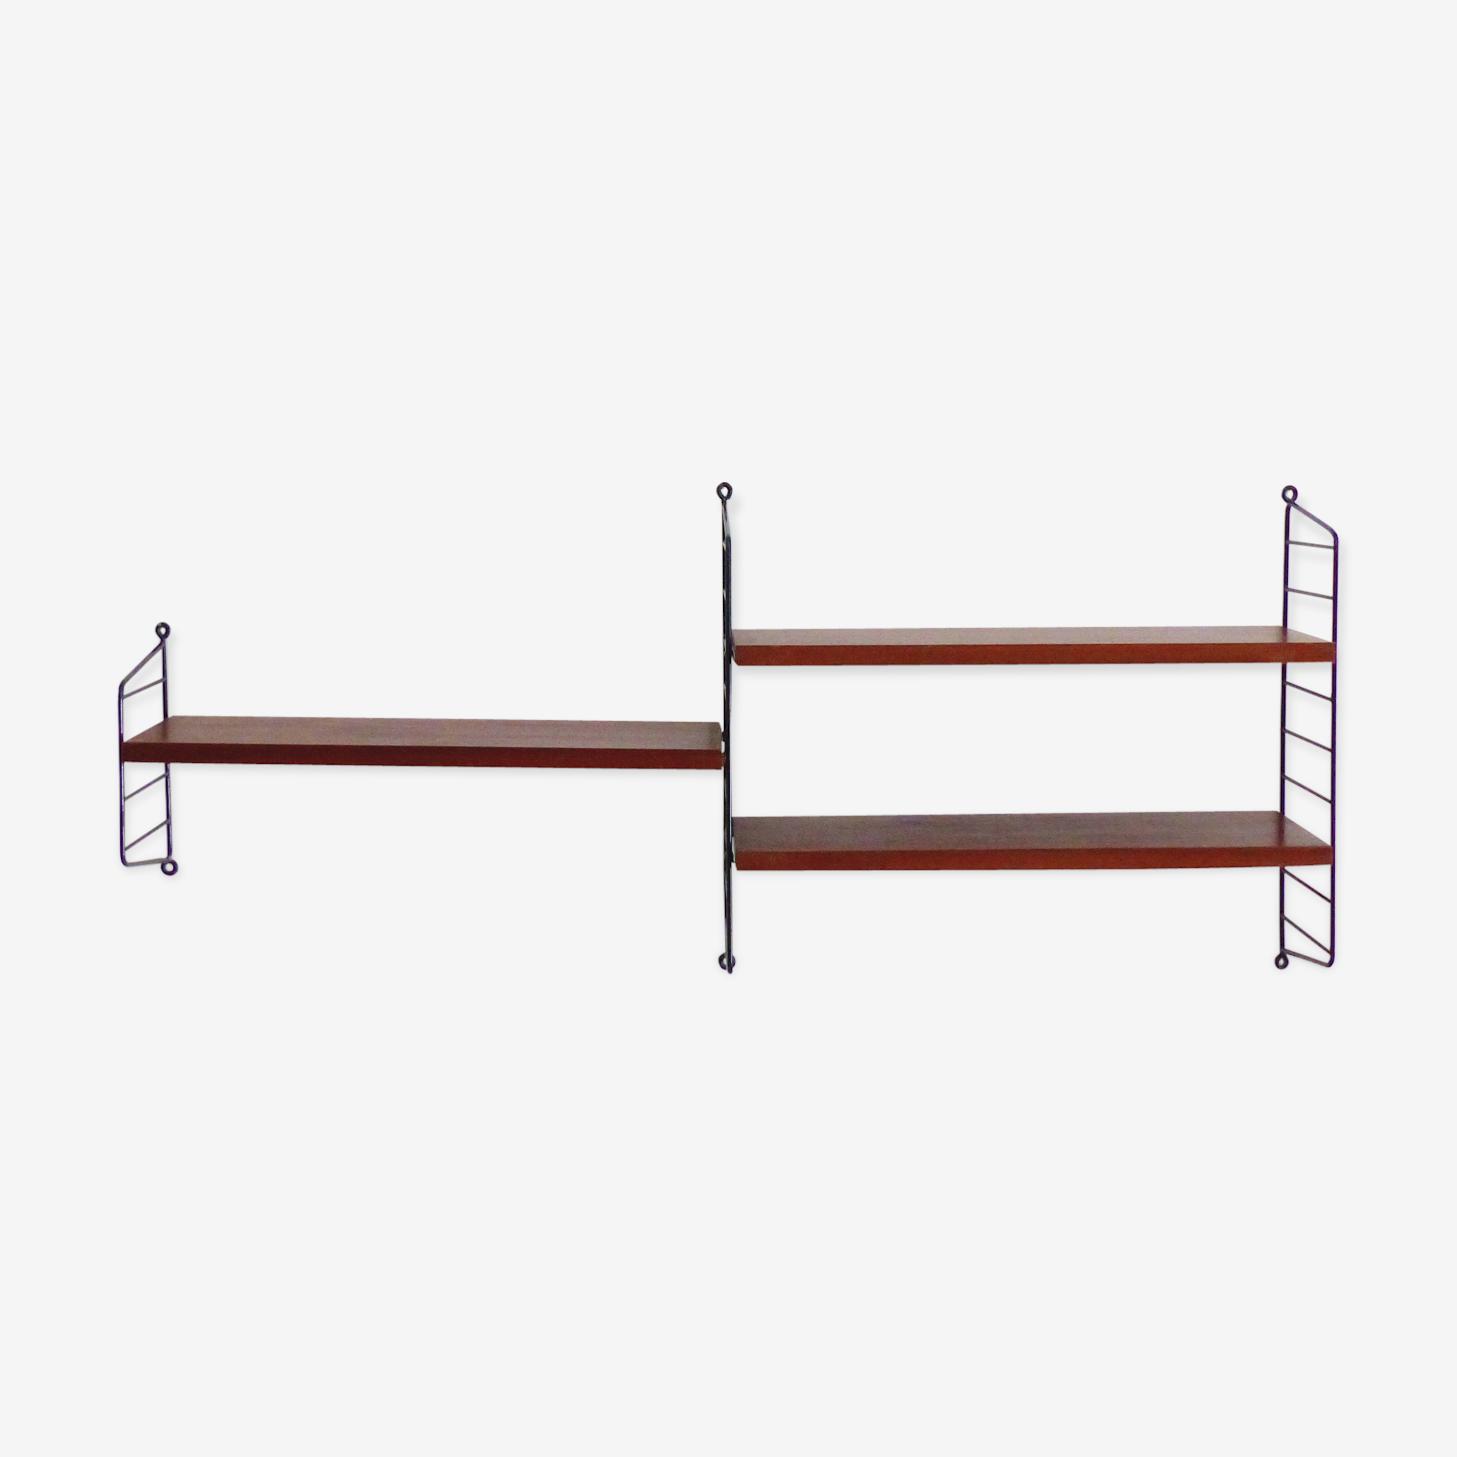 Système d'étagères modulables string de Nils (Nisse) Strinning